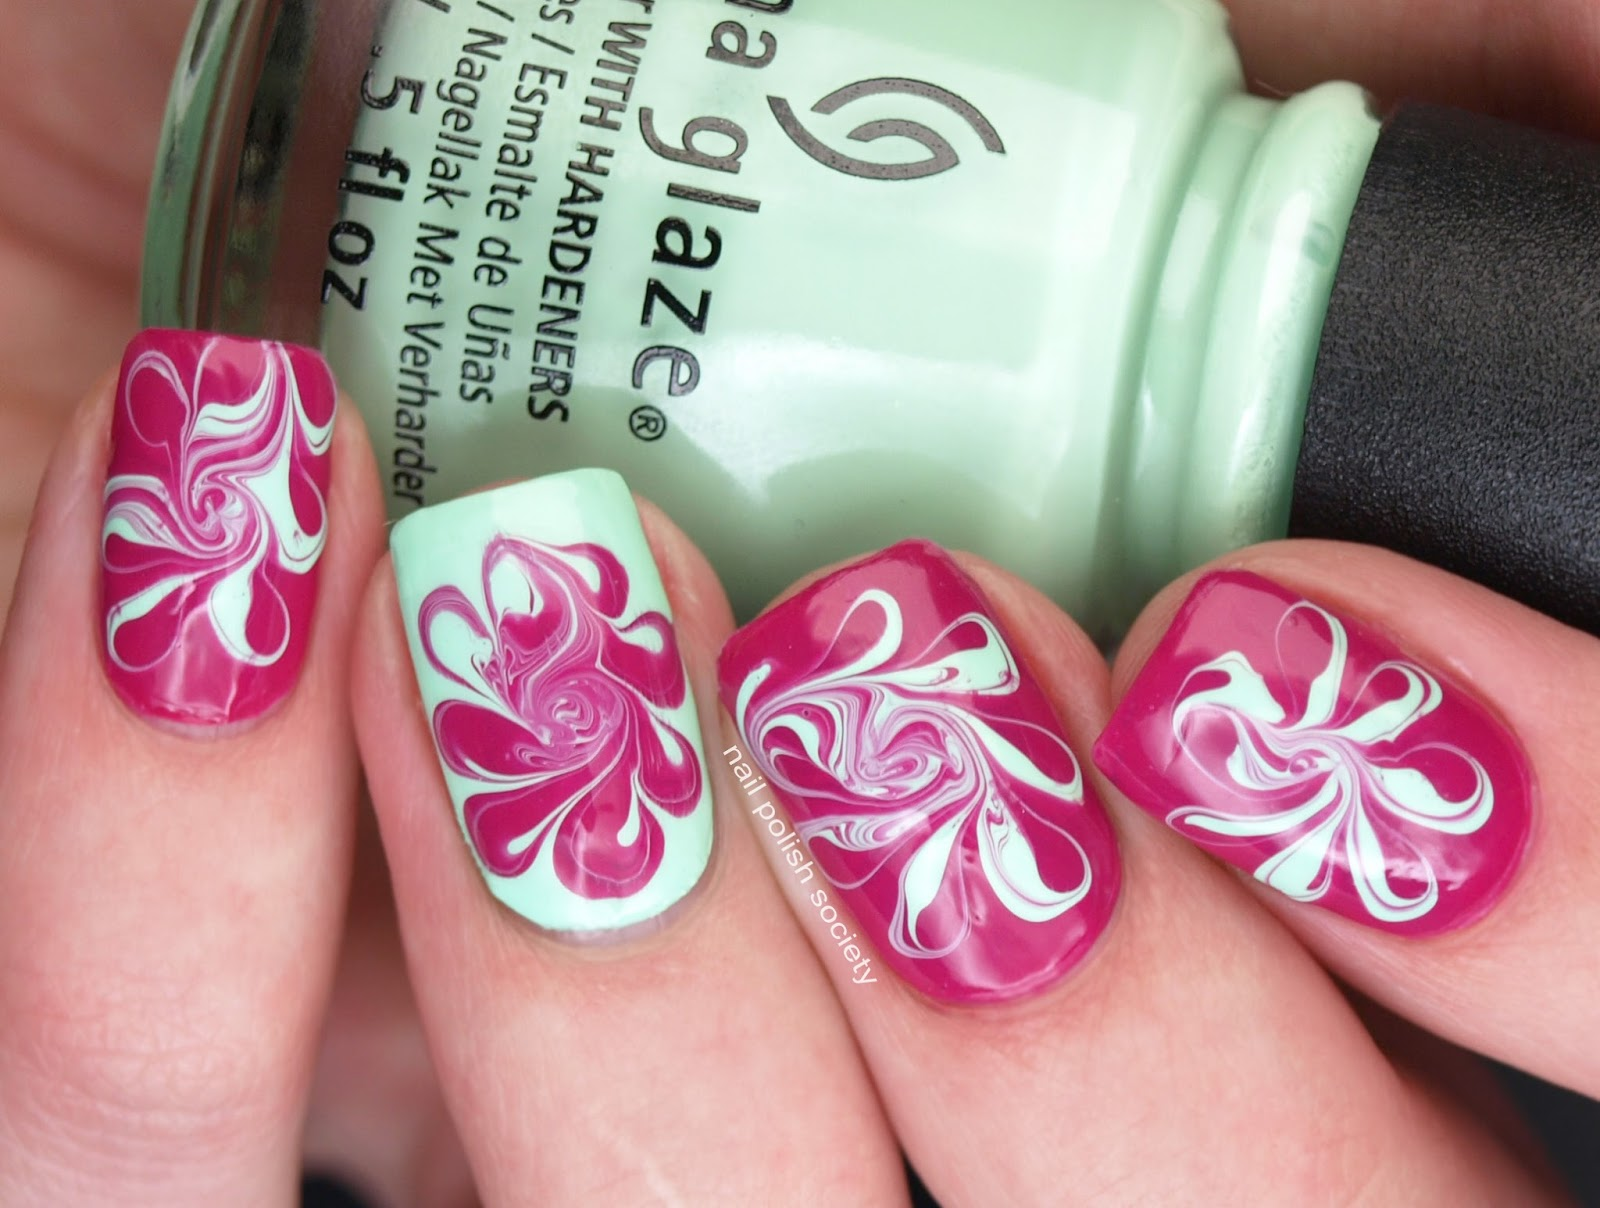 Nail Polish Society: Flower-ish Needle-Drag Marble